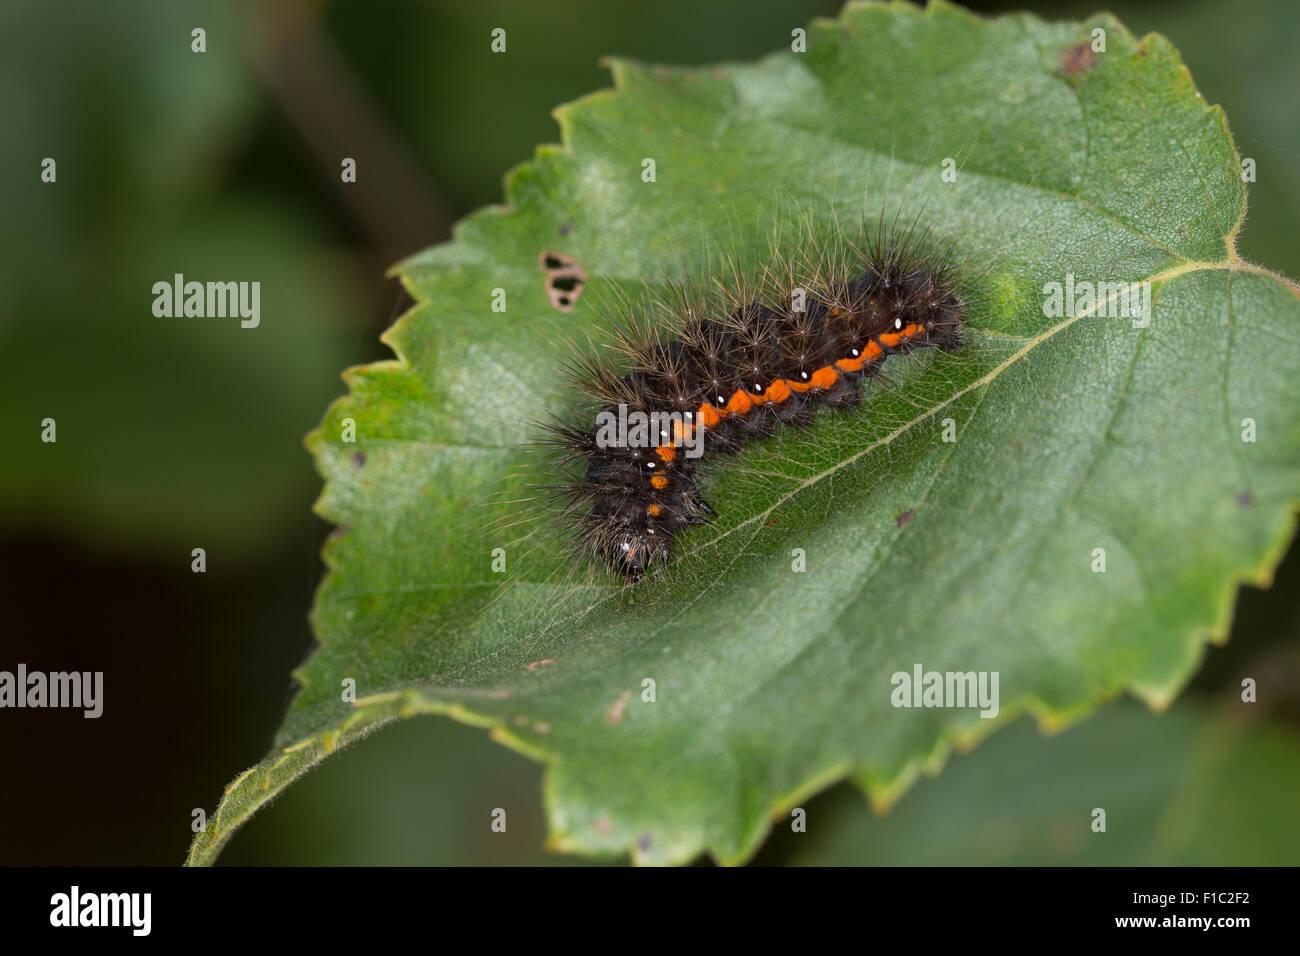 Light Knot Grass, Heidemoor-Rindeneule, Rindeneule, Fieberklee-Sumpfeule, Raupe, Acronicta menyanthidis, Apatele - Stock Image